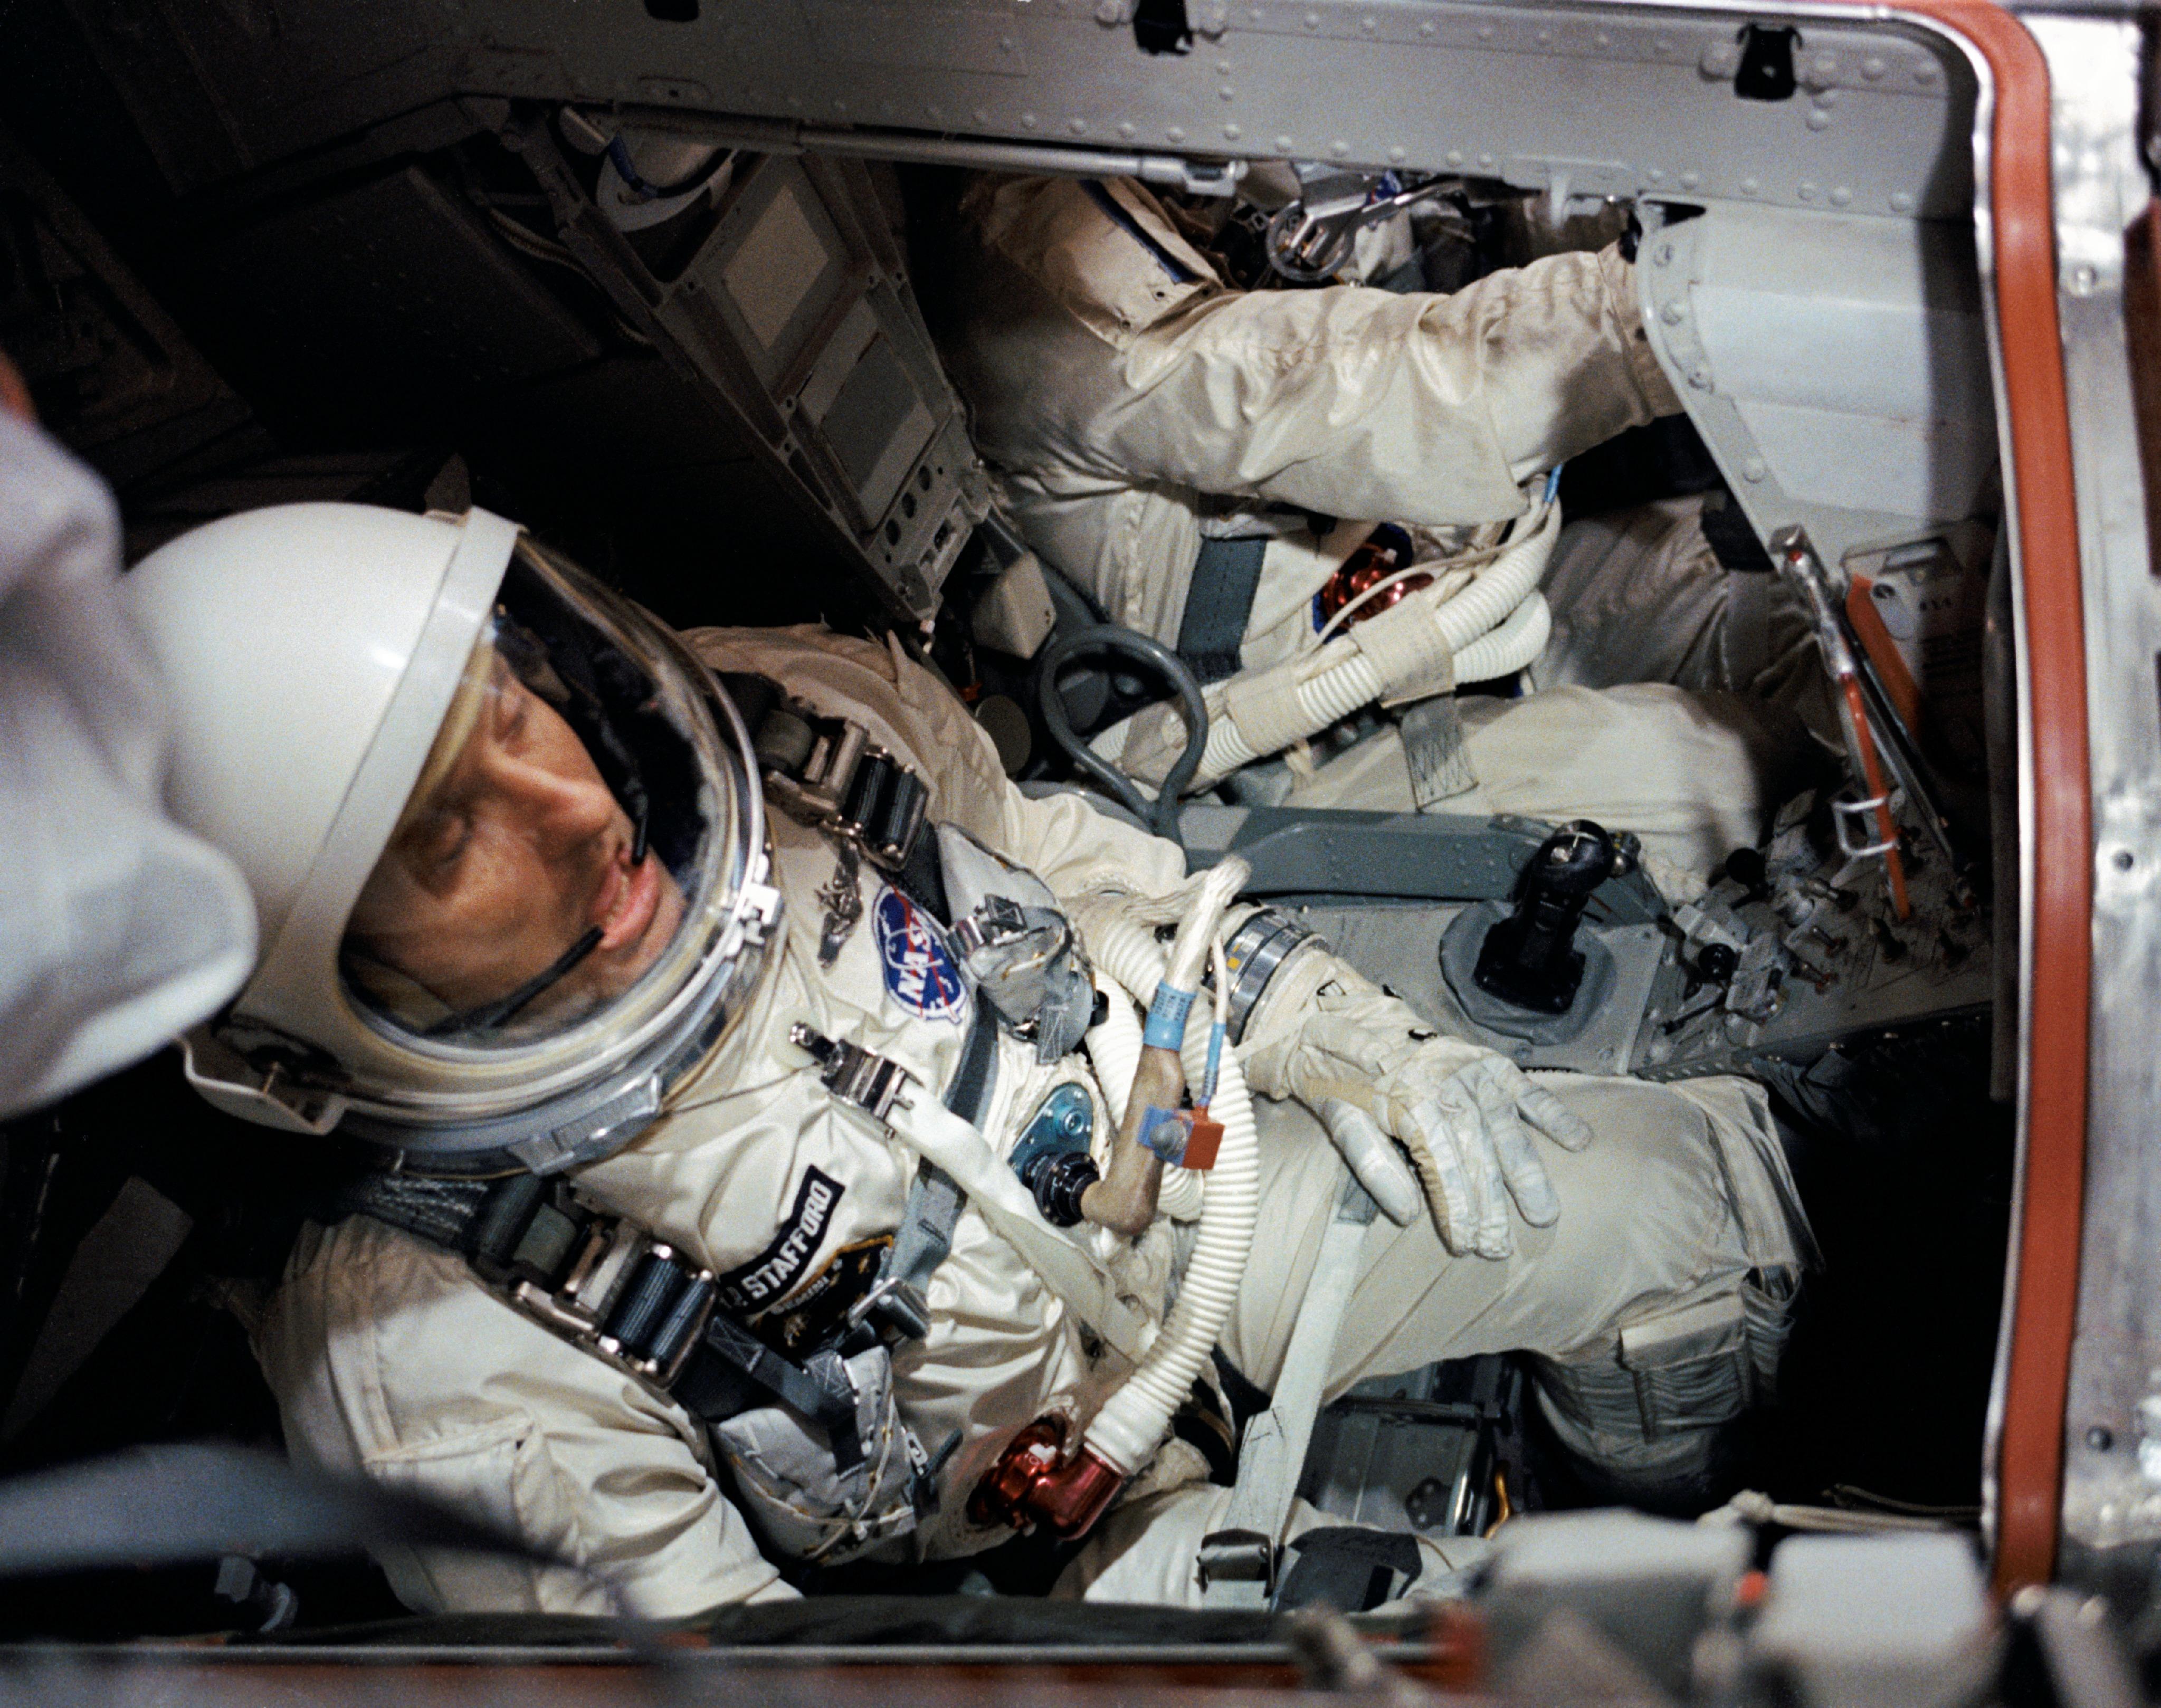 Inside The Gemini VI Spacecraft